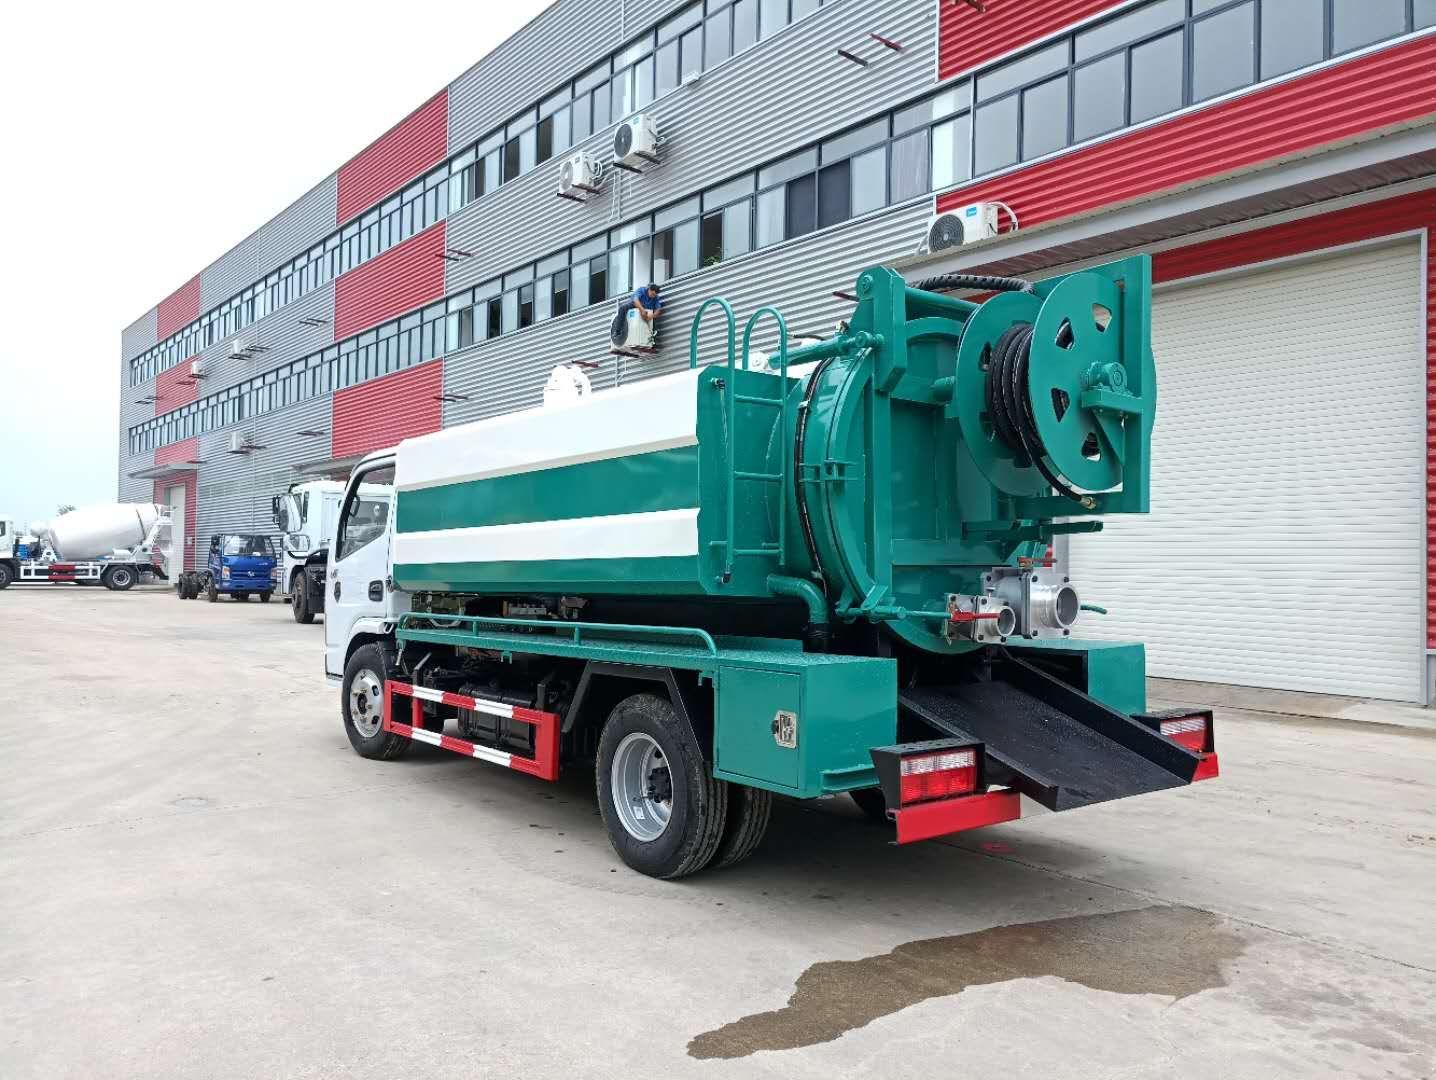 DLK D6 ہوا سکشن صفائی سیوریج ٹرک 1